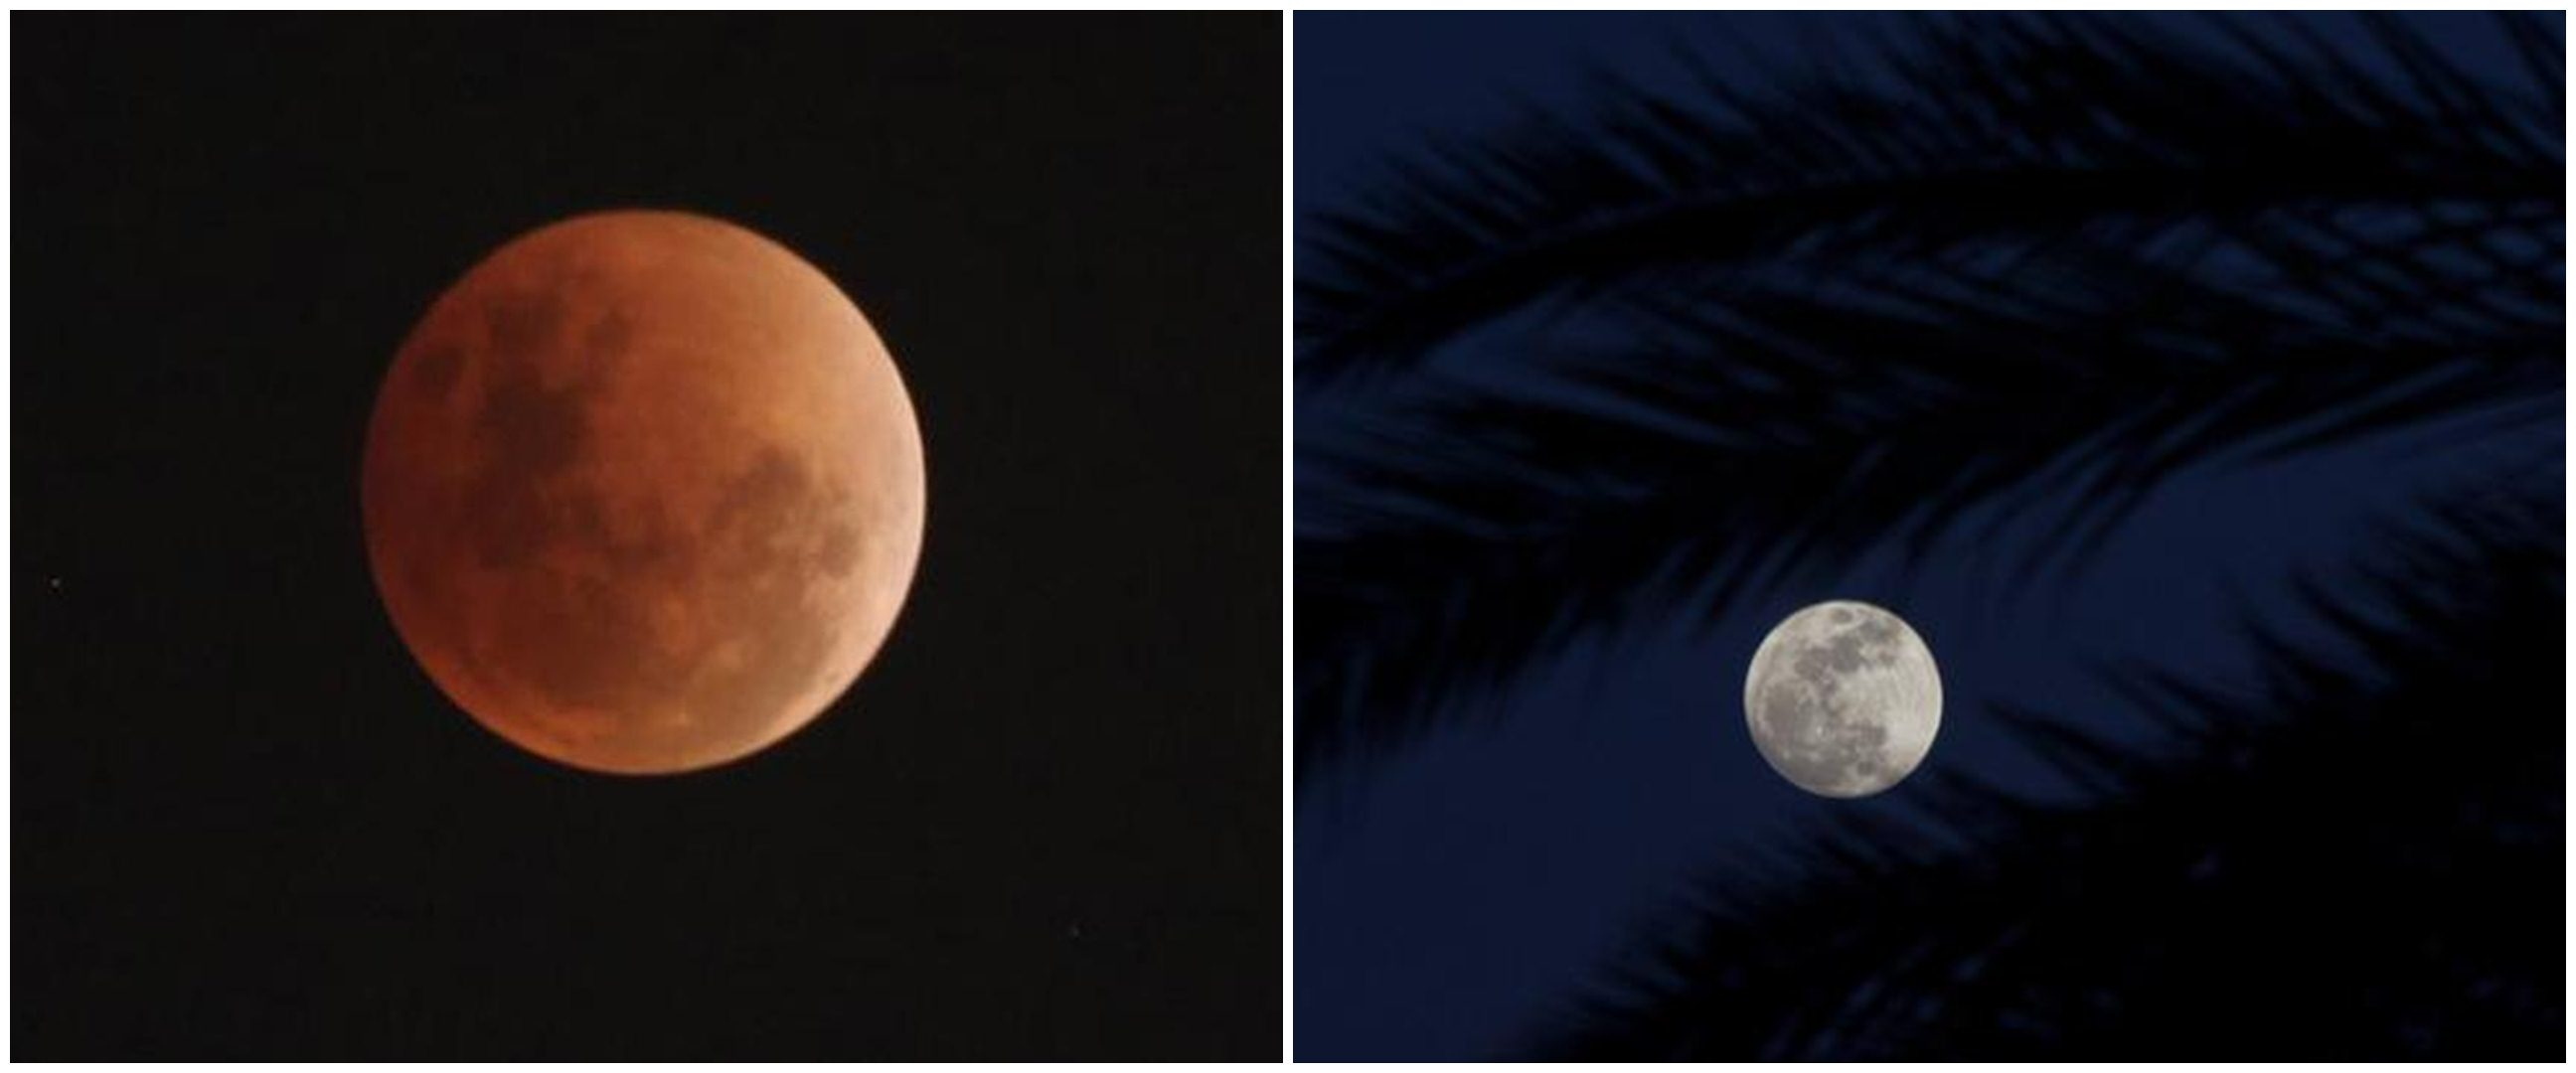 4 Fakta bulan purnama 'Worm Moon', fenomena langit hari ini